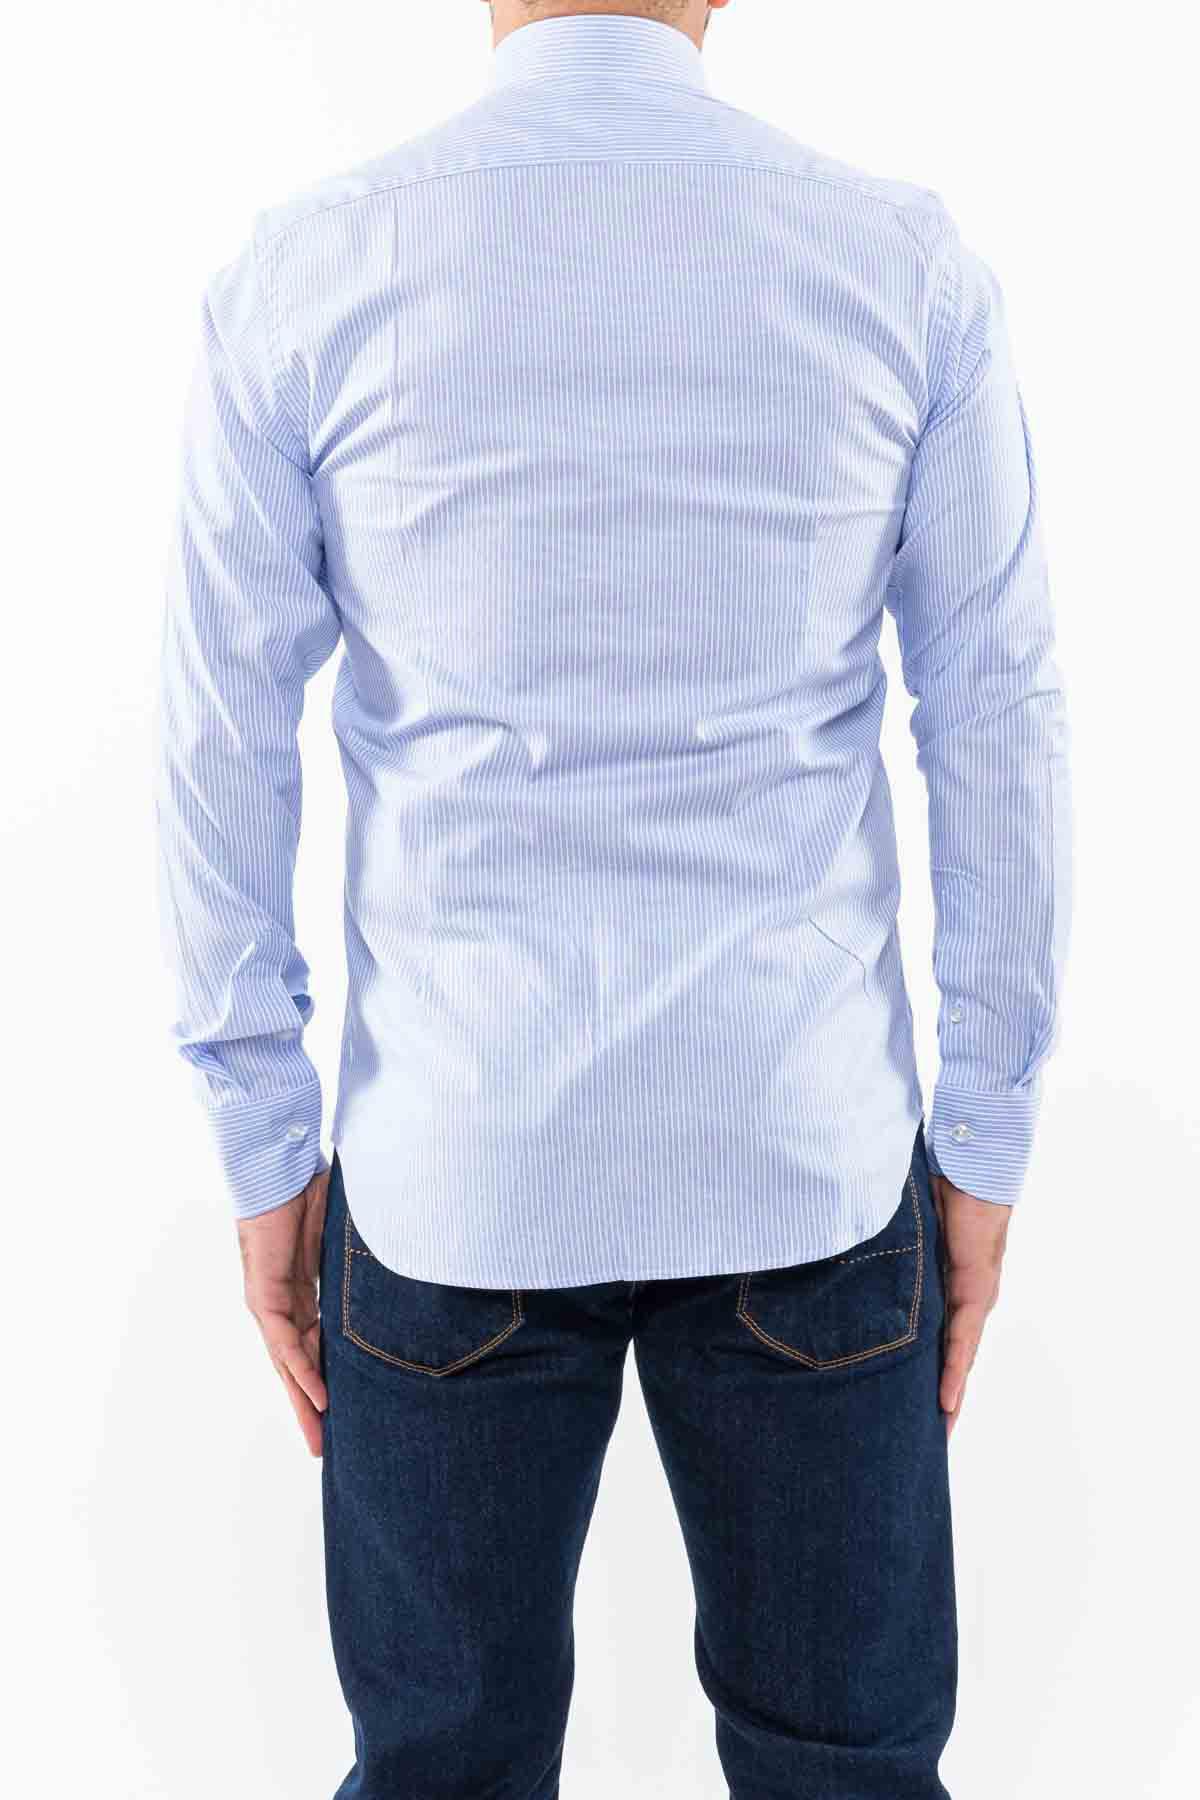 camicia,celeste